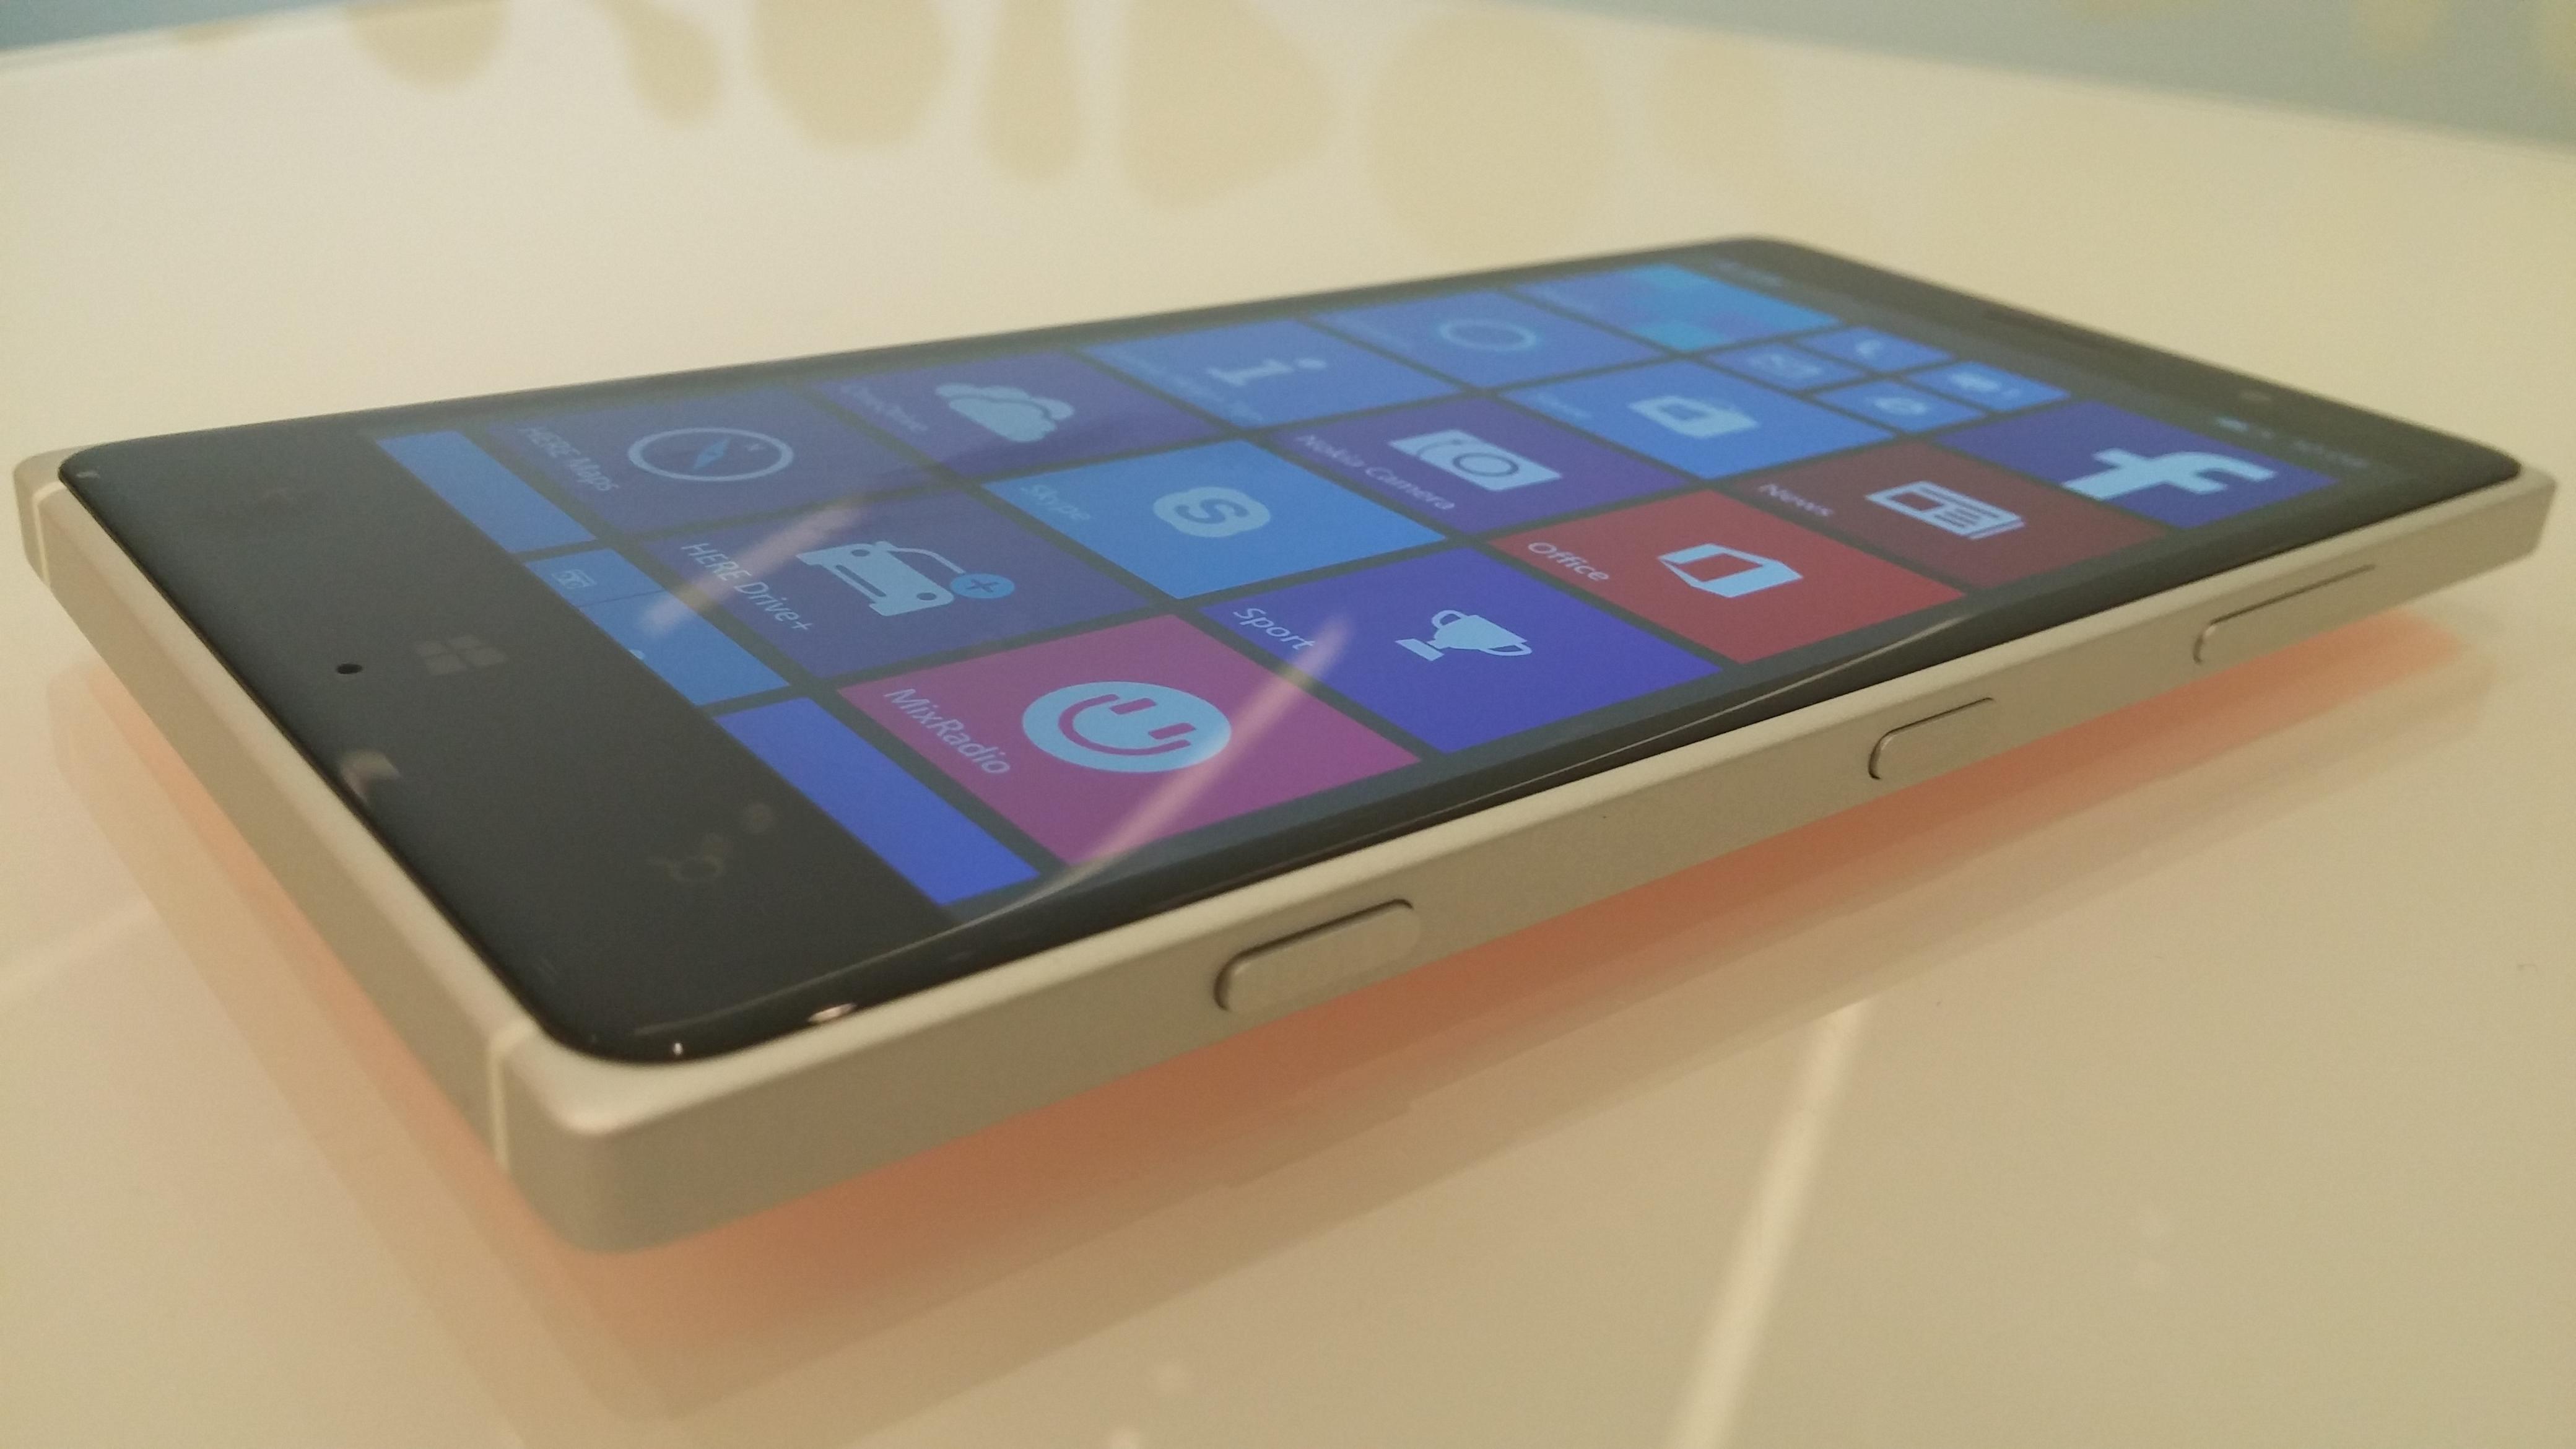 Microsoft Lumia 830 Hands-On